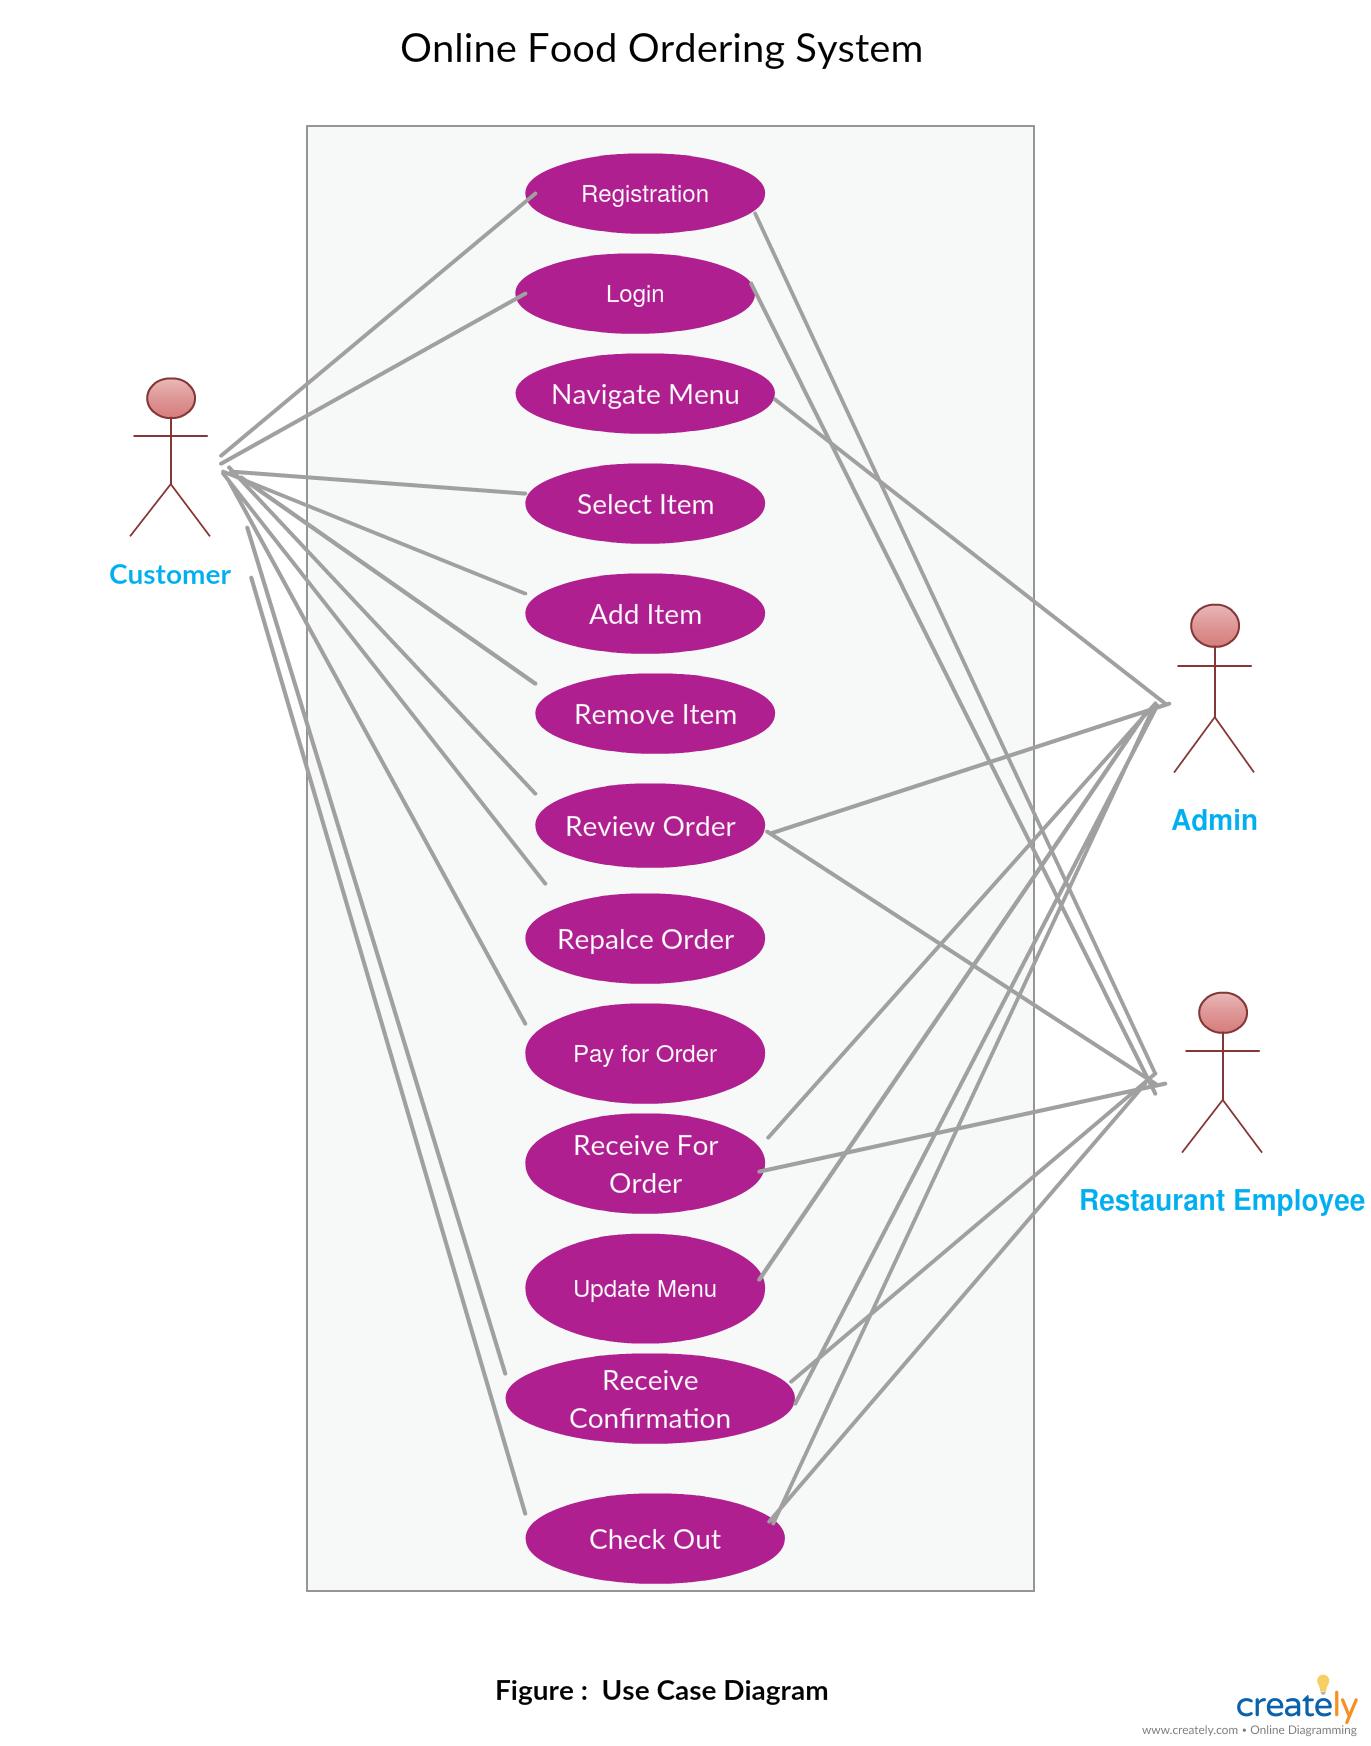 Entity Relationship Diagram Visio : entity, relationship, diagram, visio, Online, Ordering, System, Order, Food,, Relationship, Diagram